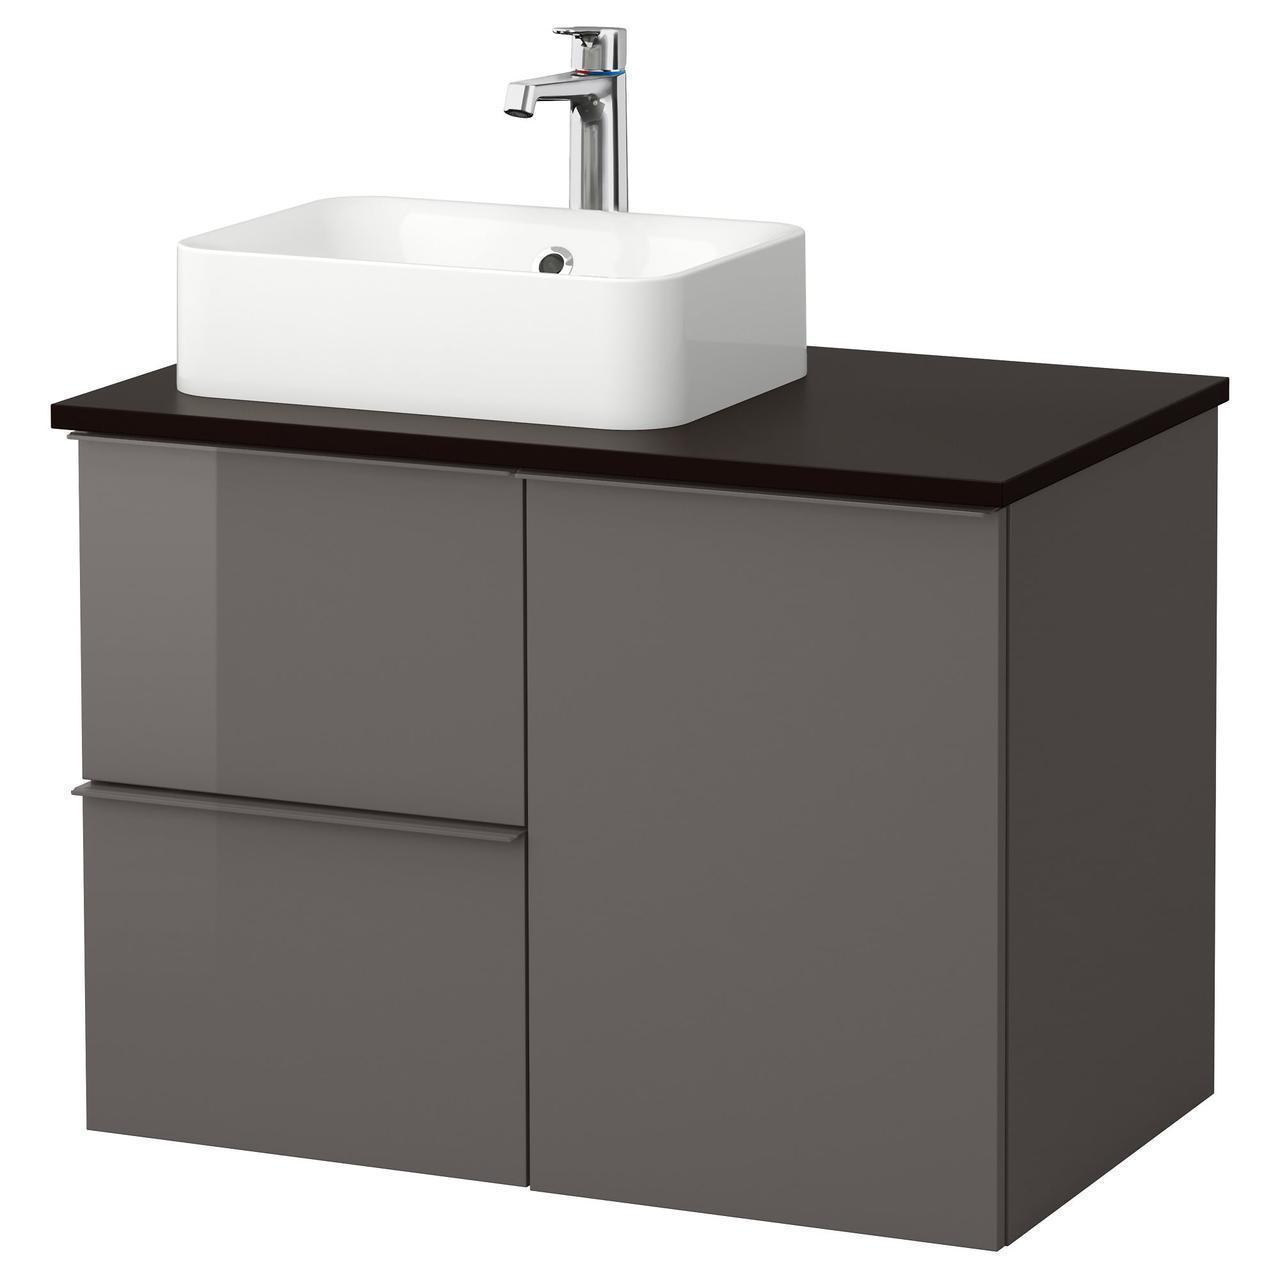 IKEA GODMORGON/TOLKEN/HORVIK Шкаф под умывальник с раковиной 45x32, глянцевый серый, антрацит  (492.080.13)